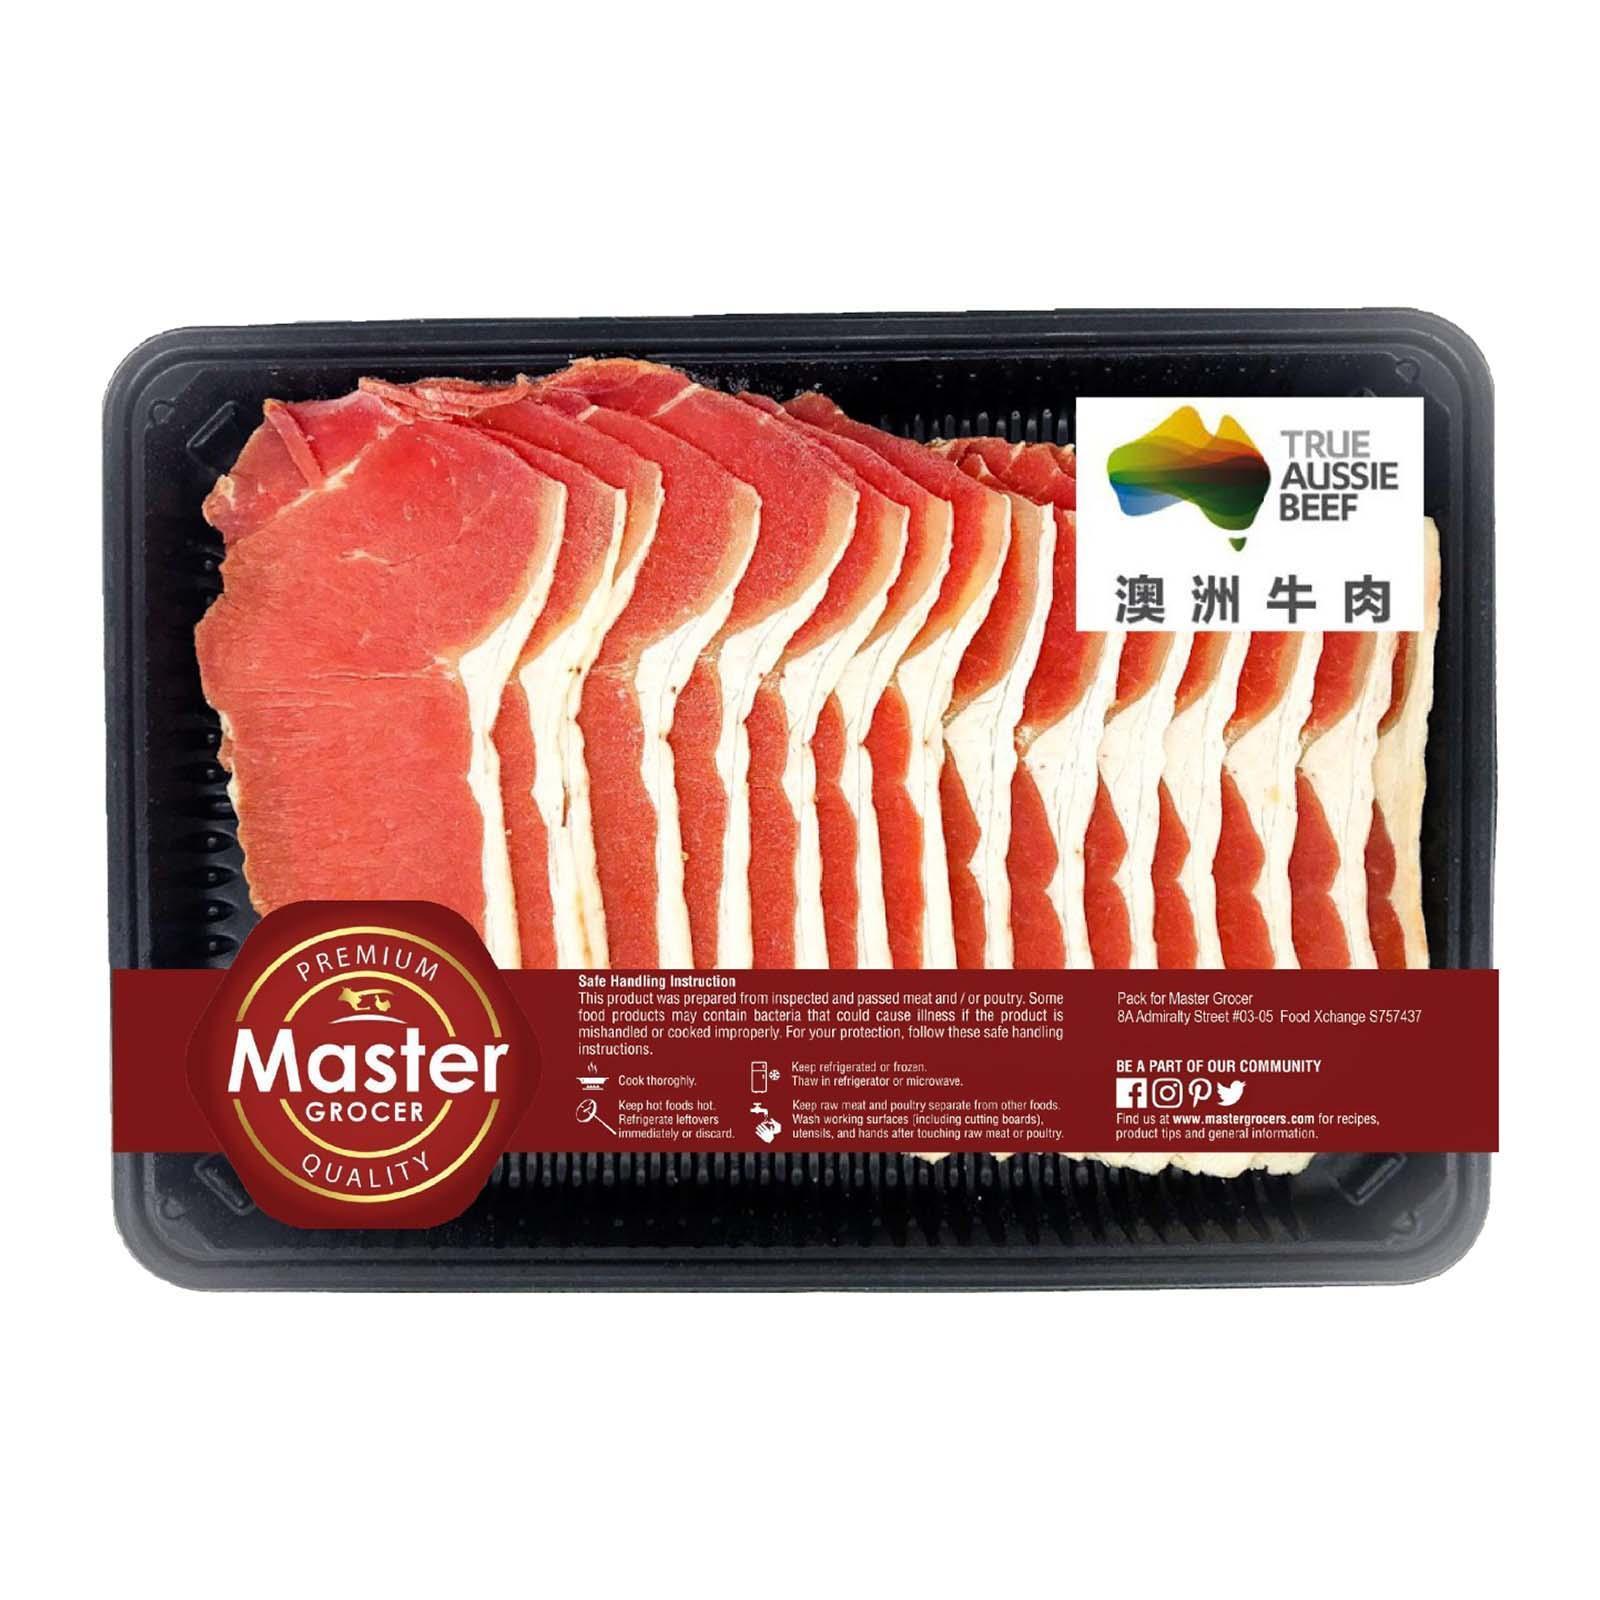 Master Grocer Australia Beef Striploin Shabu Shabu - Frozen